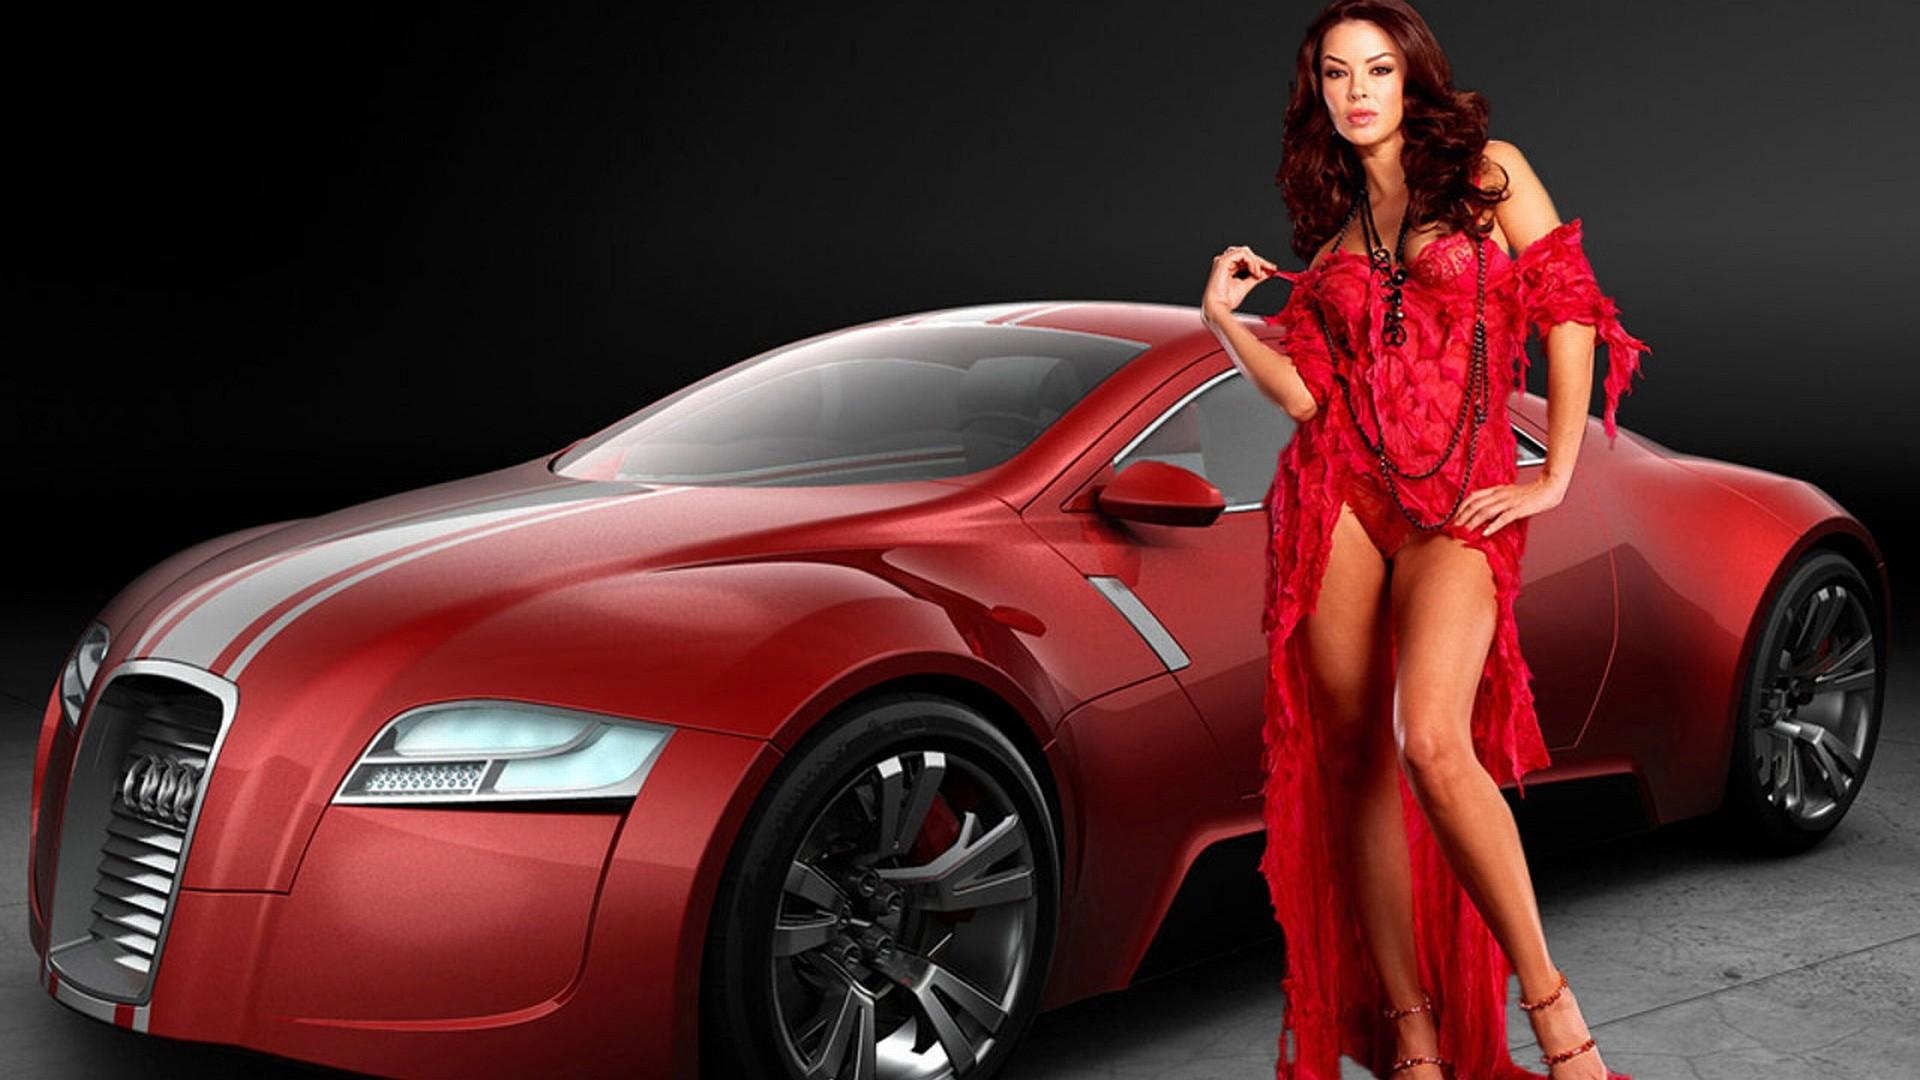 Car Show Girl Wallpaper